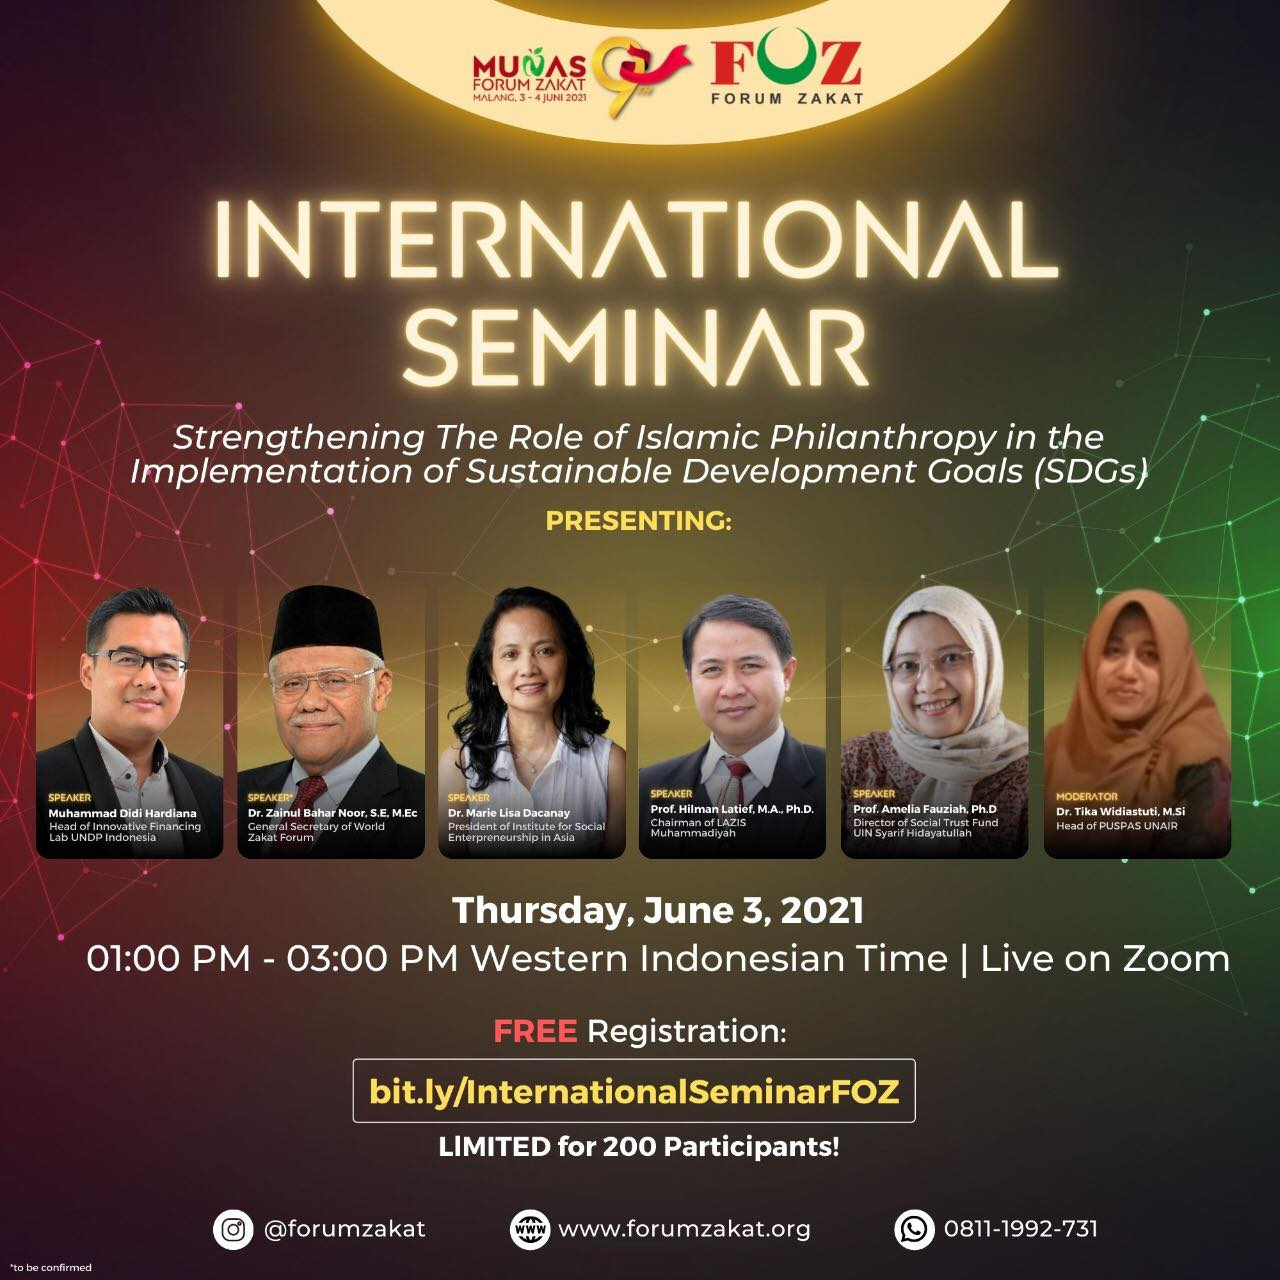 ISEA joins the International Seminar organized by Forum Zakat Indonesia